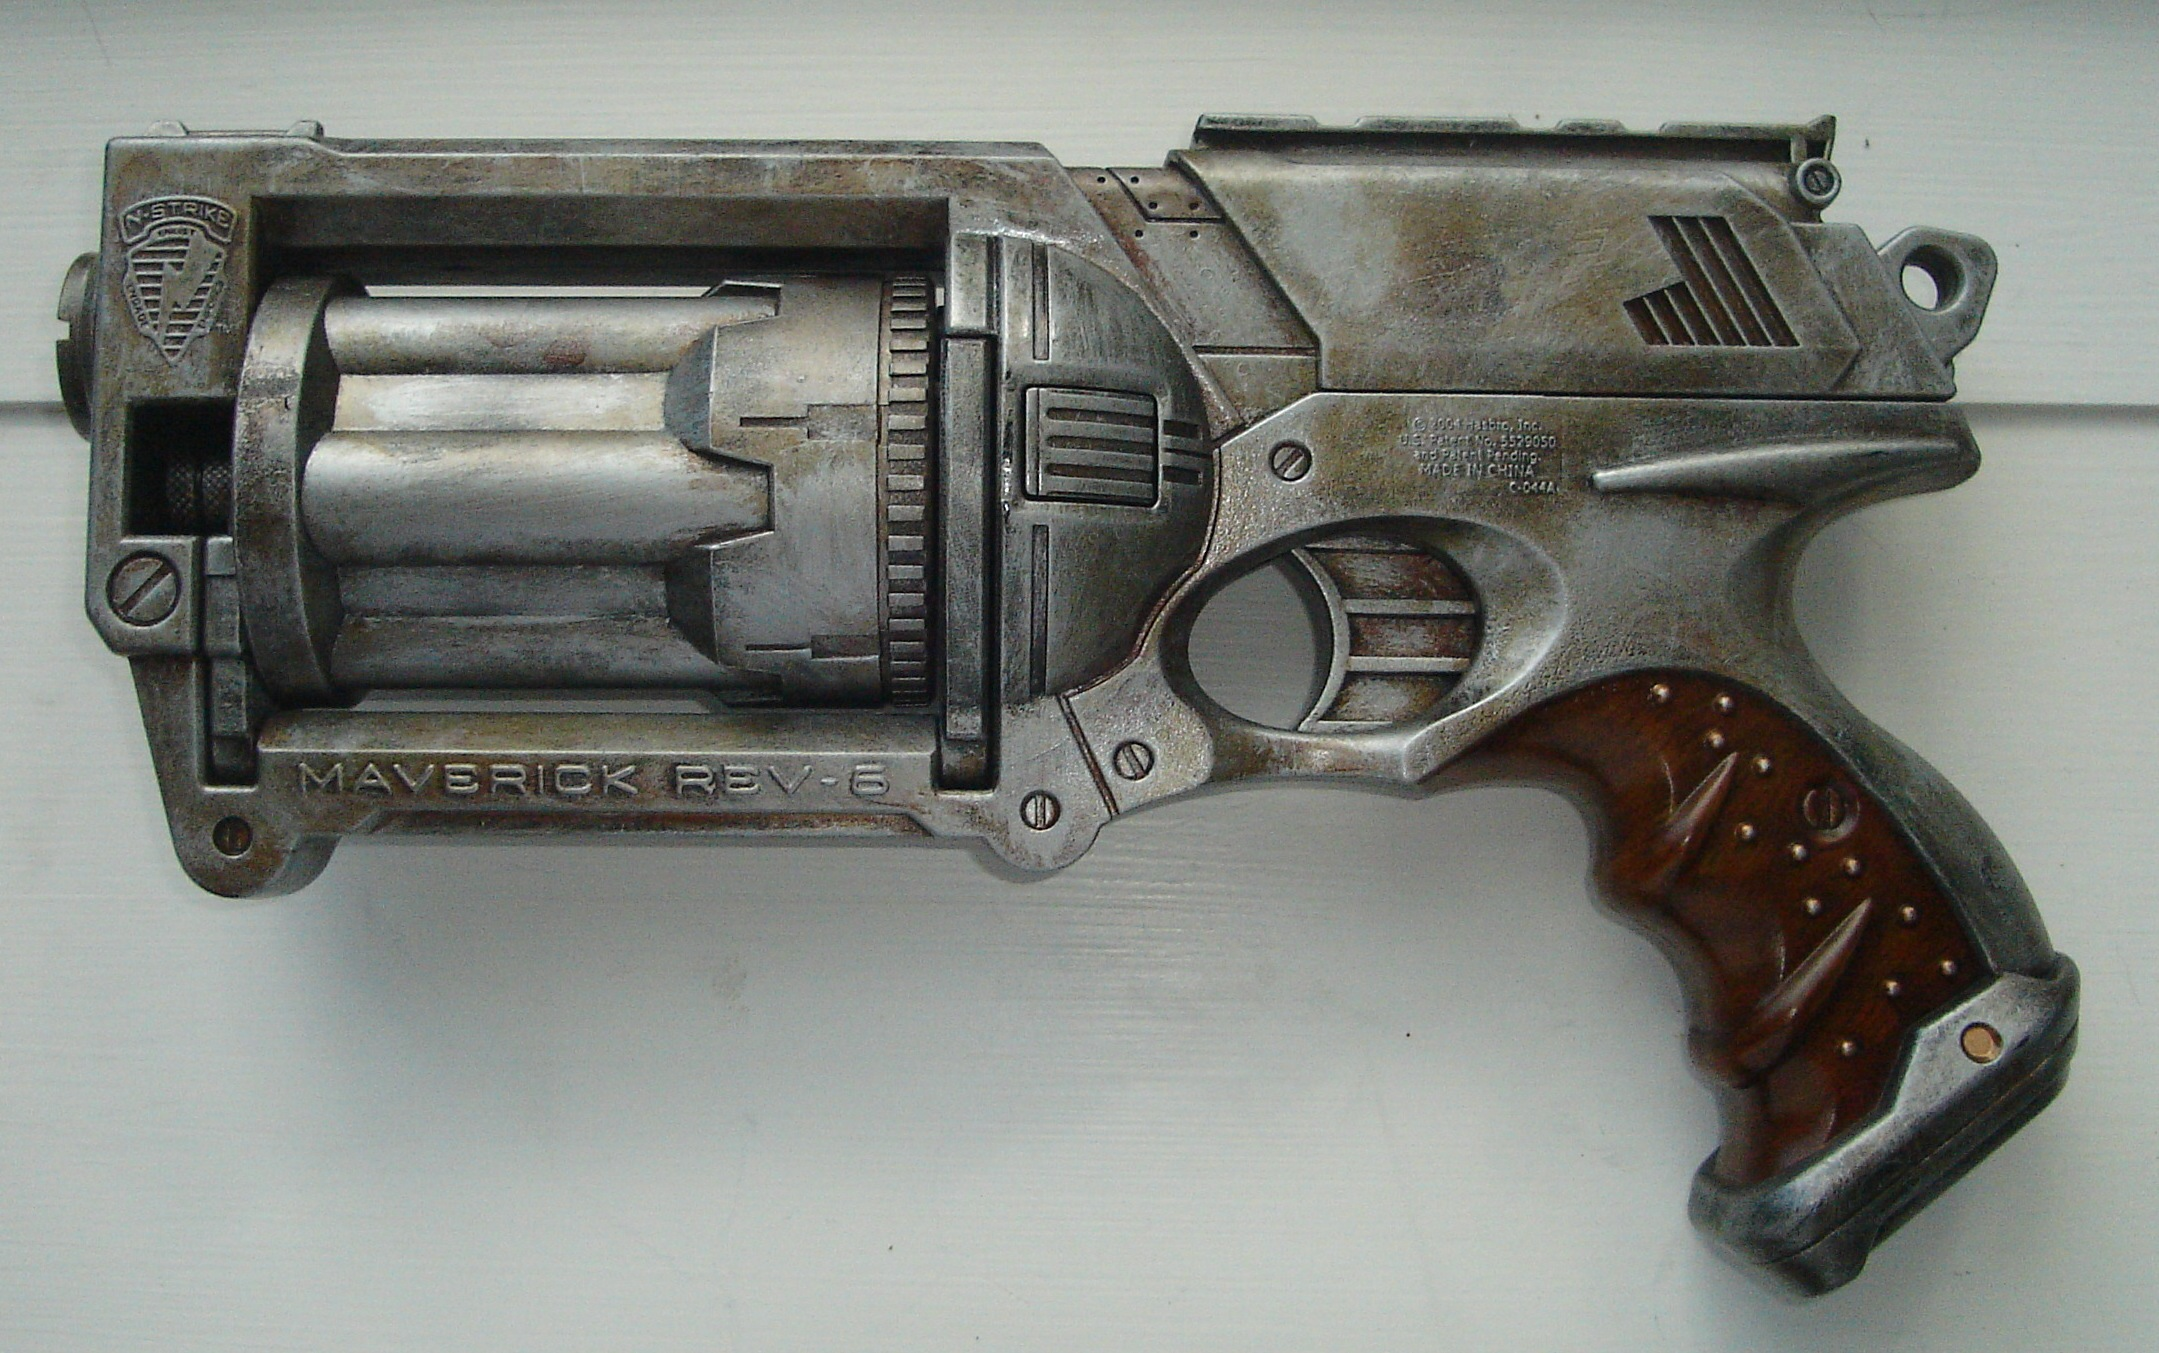 Custom Painted Nerf Gun Great For Cosplay, Dieselpunk, Steampunk Comicon